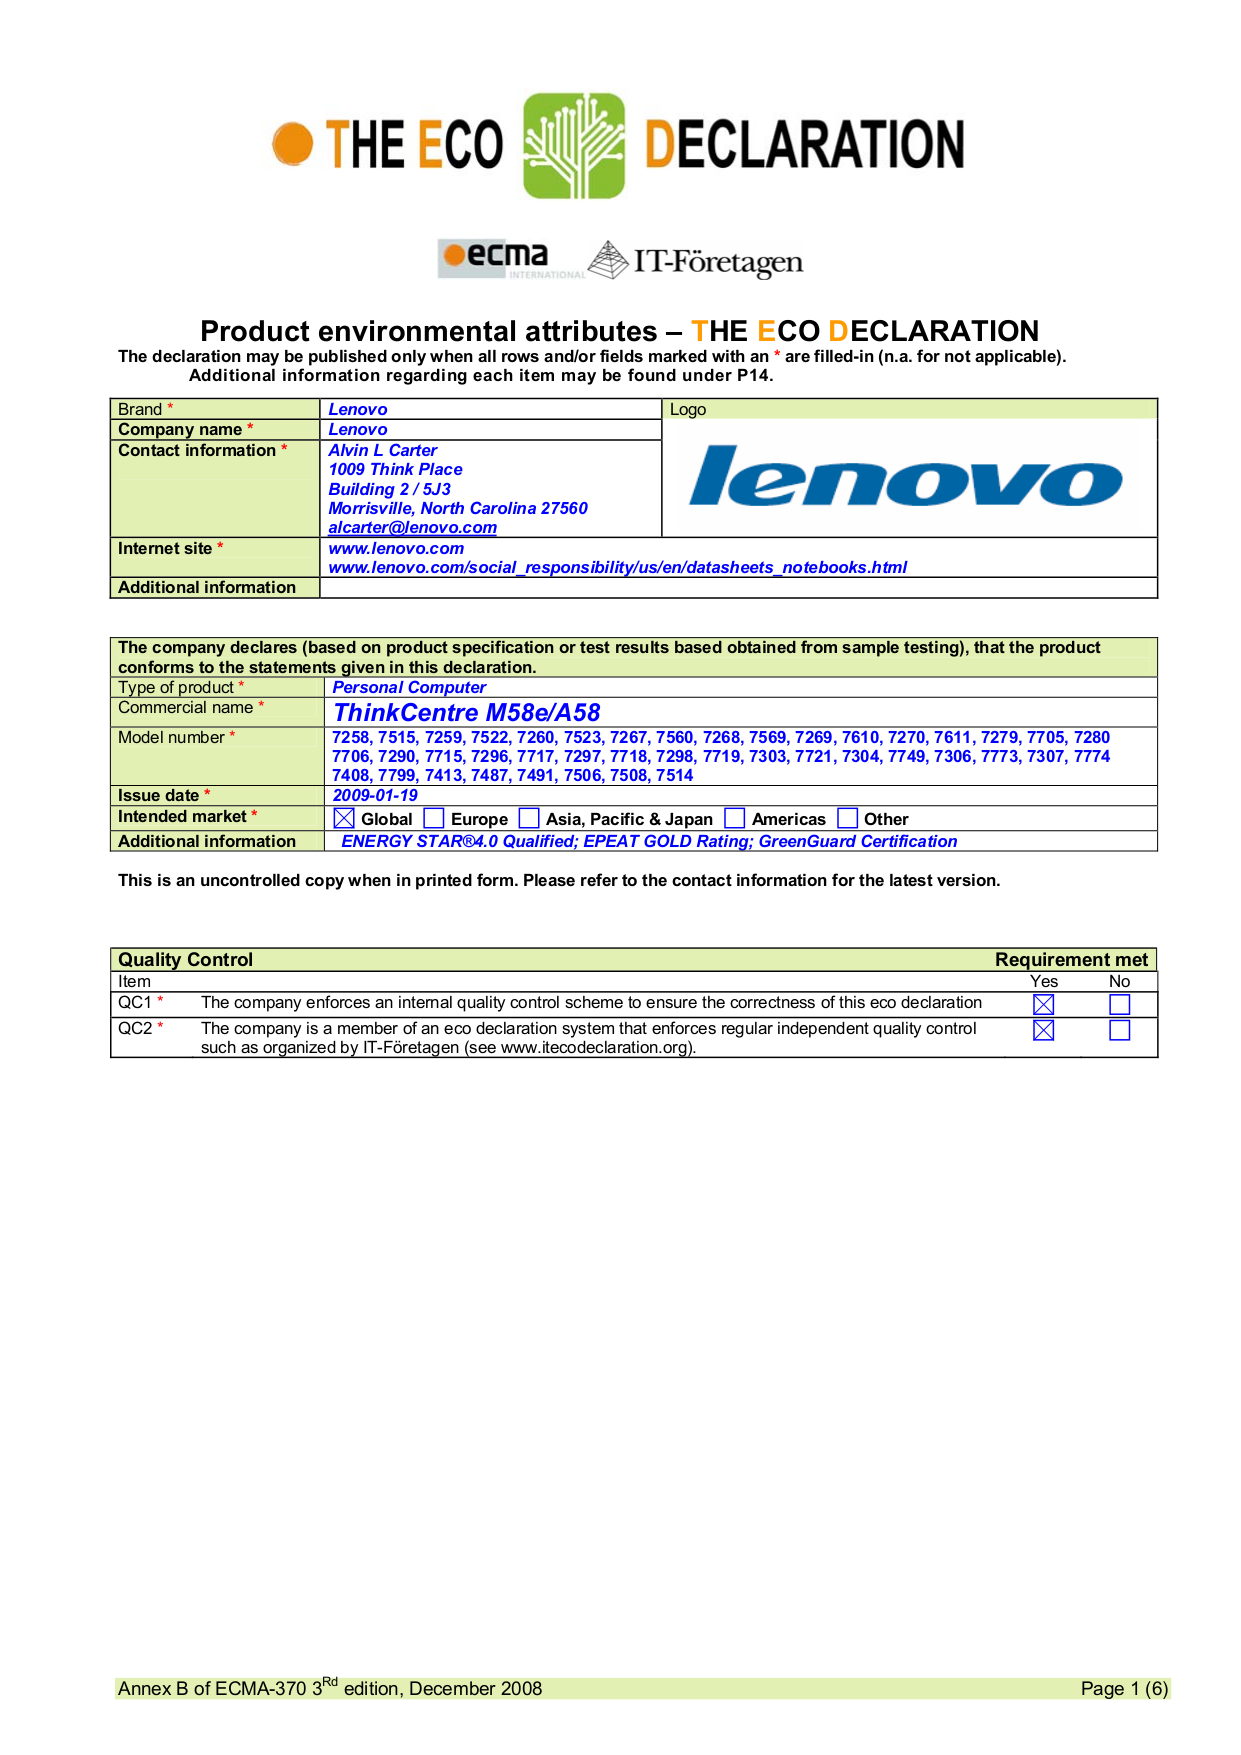 pdf for Lenovo Desktop ThinkCentre A58 7715 manual